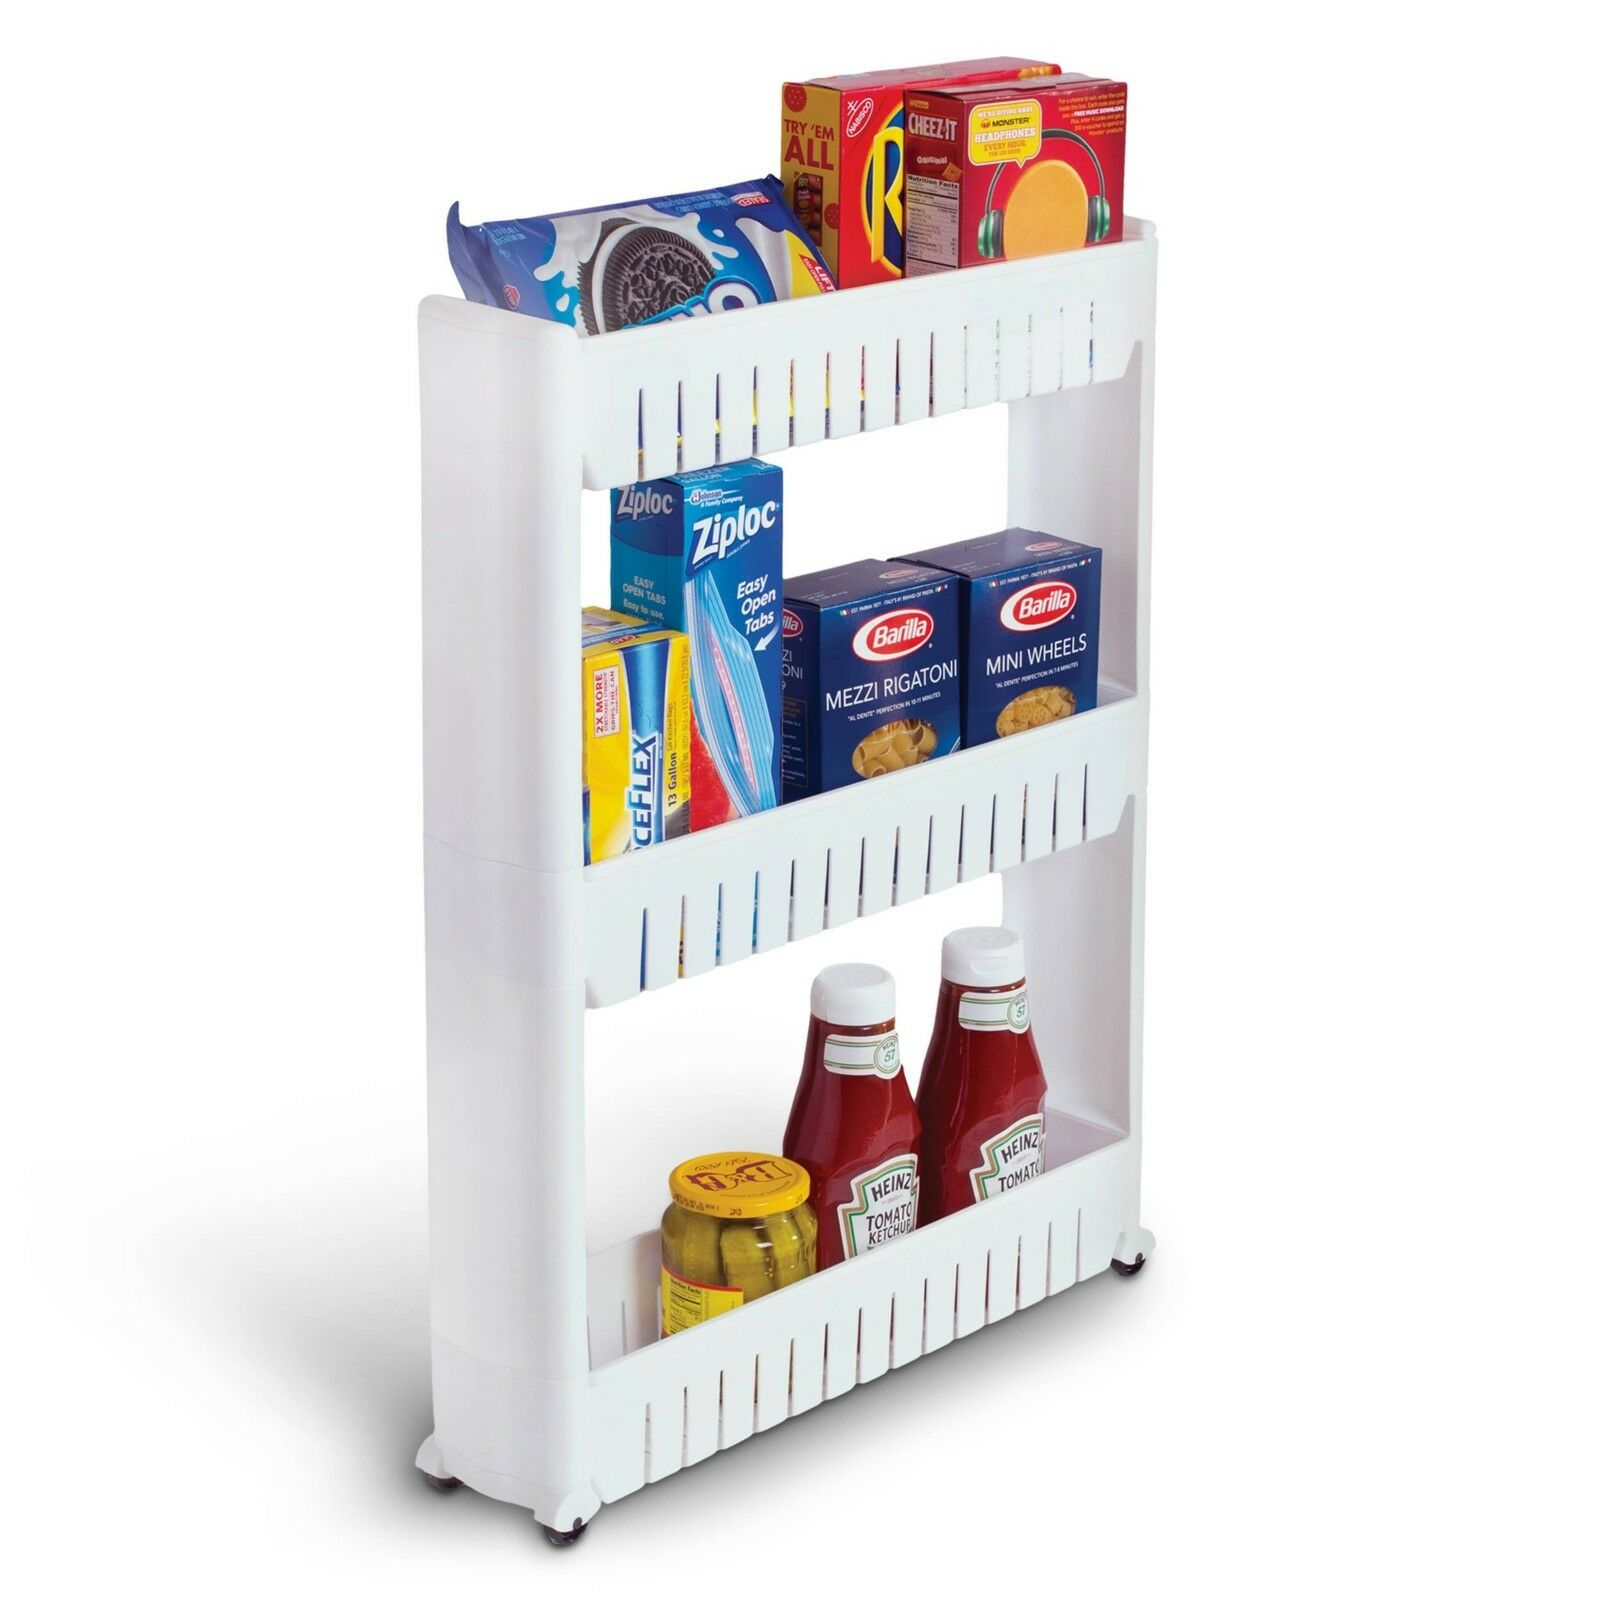 Bathroom and Kitchen Slim Storage Organizer - Slide Out Shelf Storage Tower as a